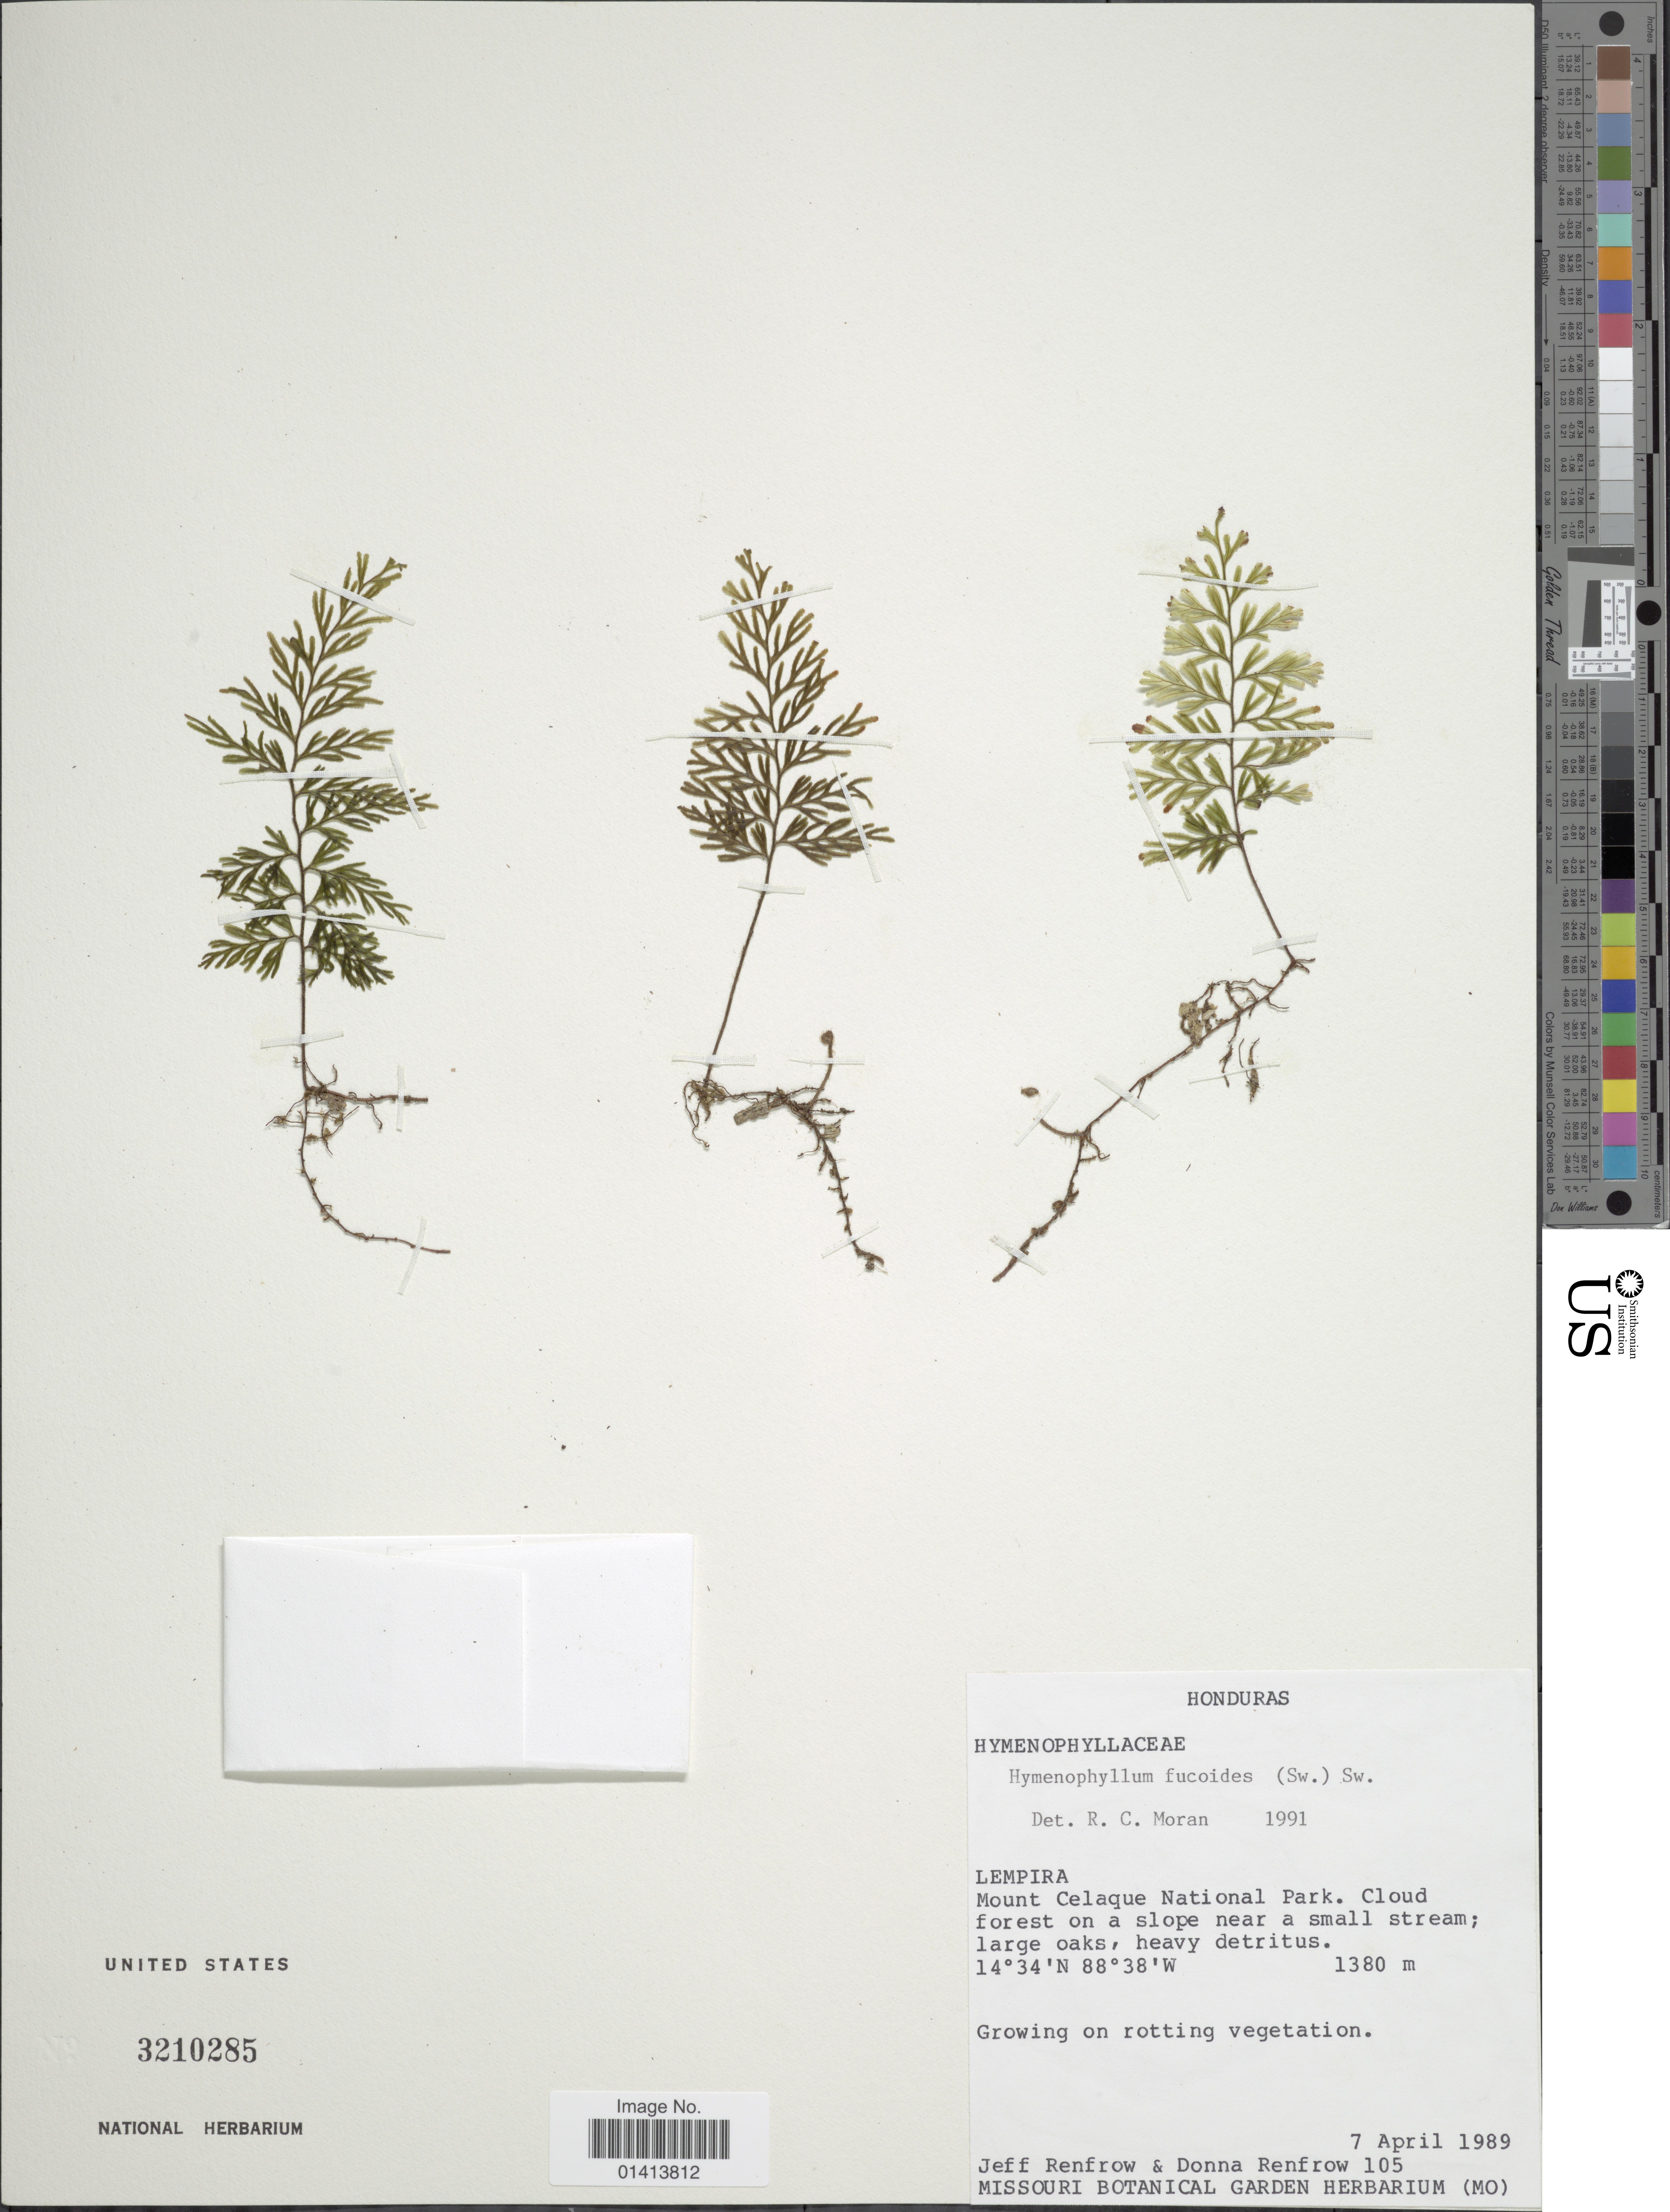 Image of graceful filmy fern